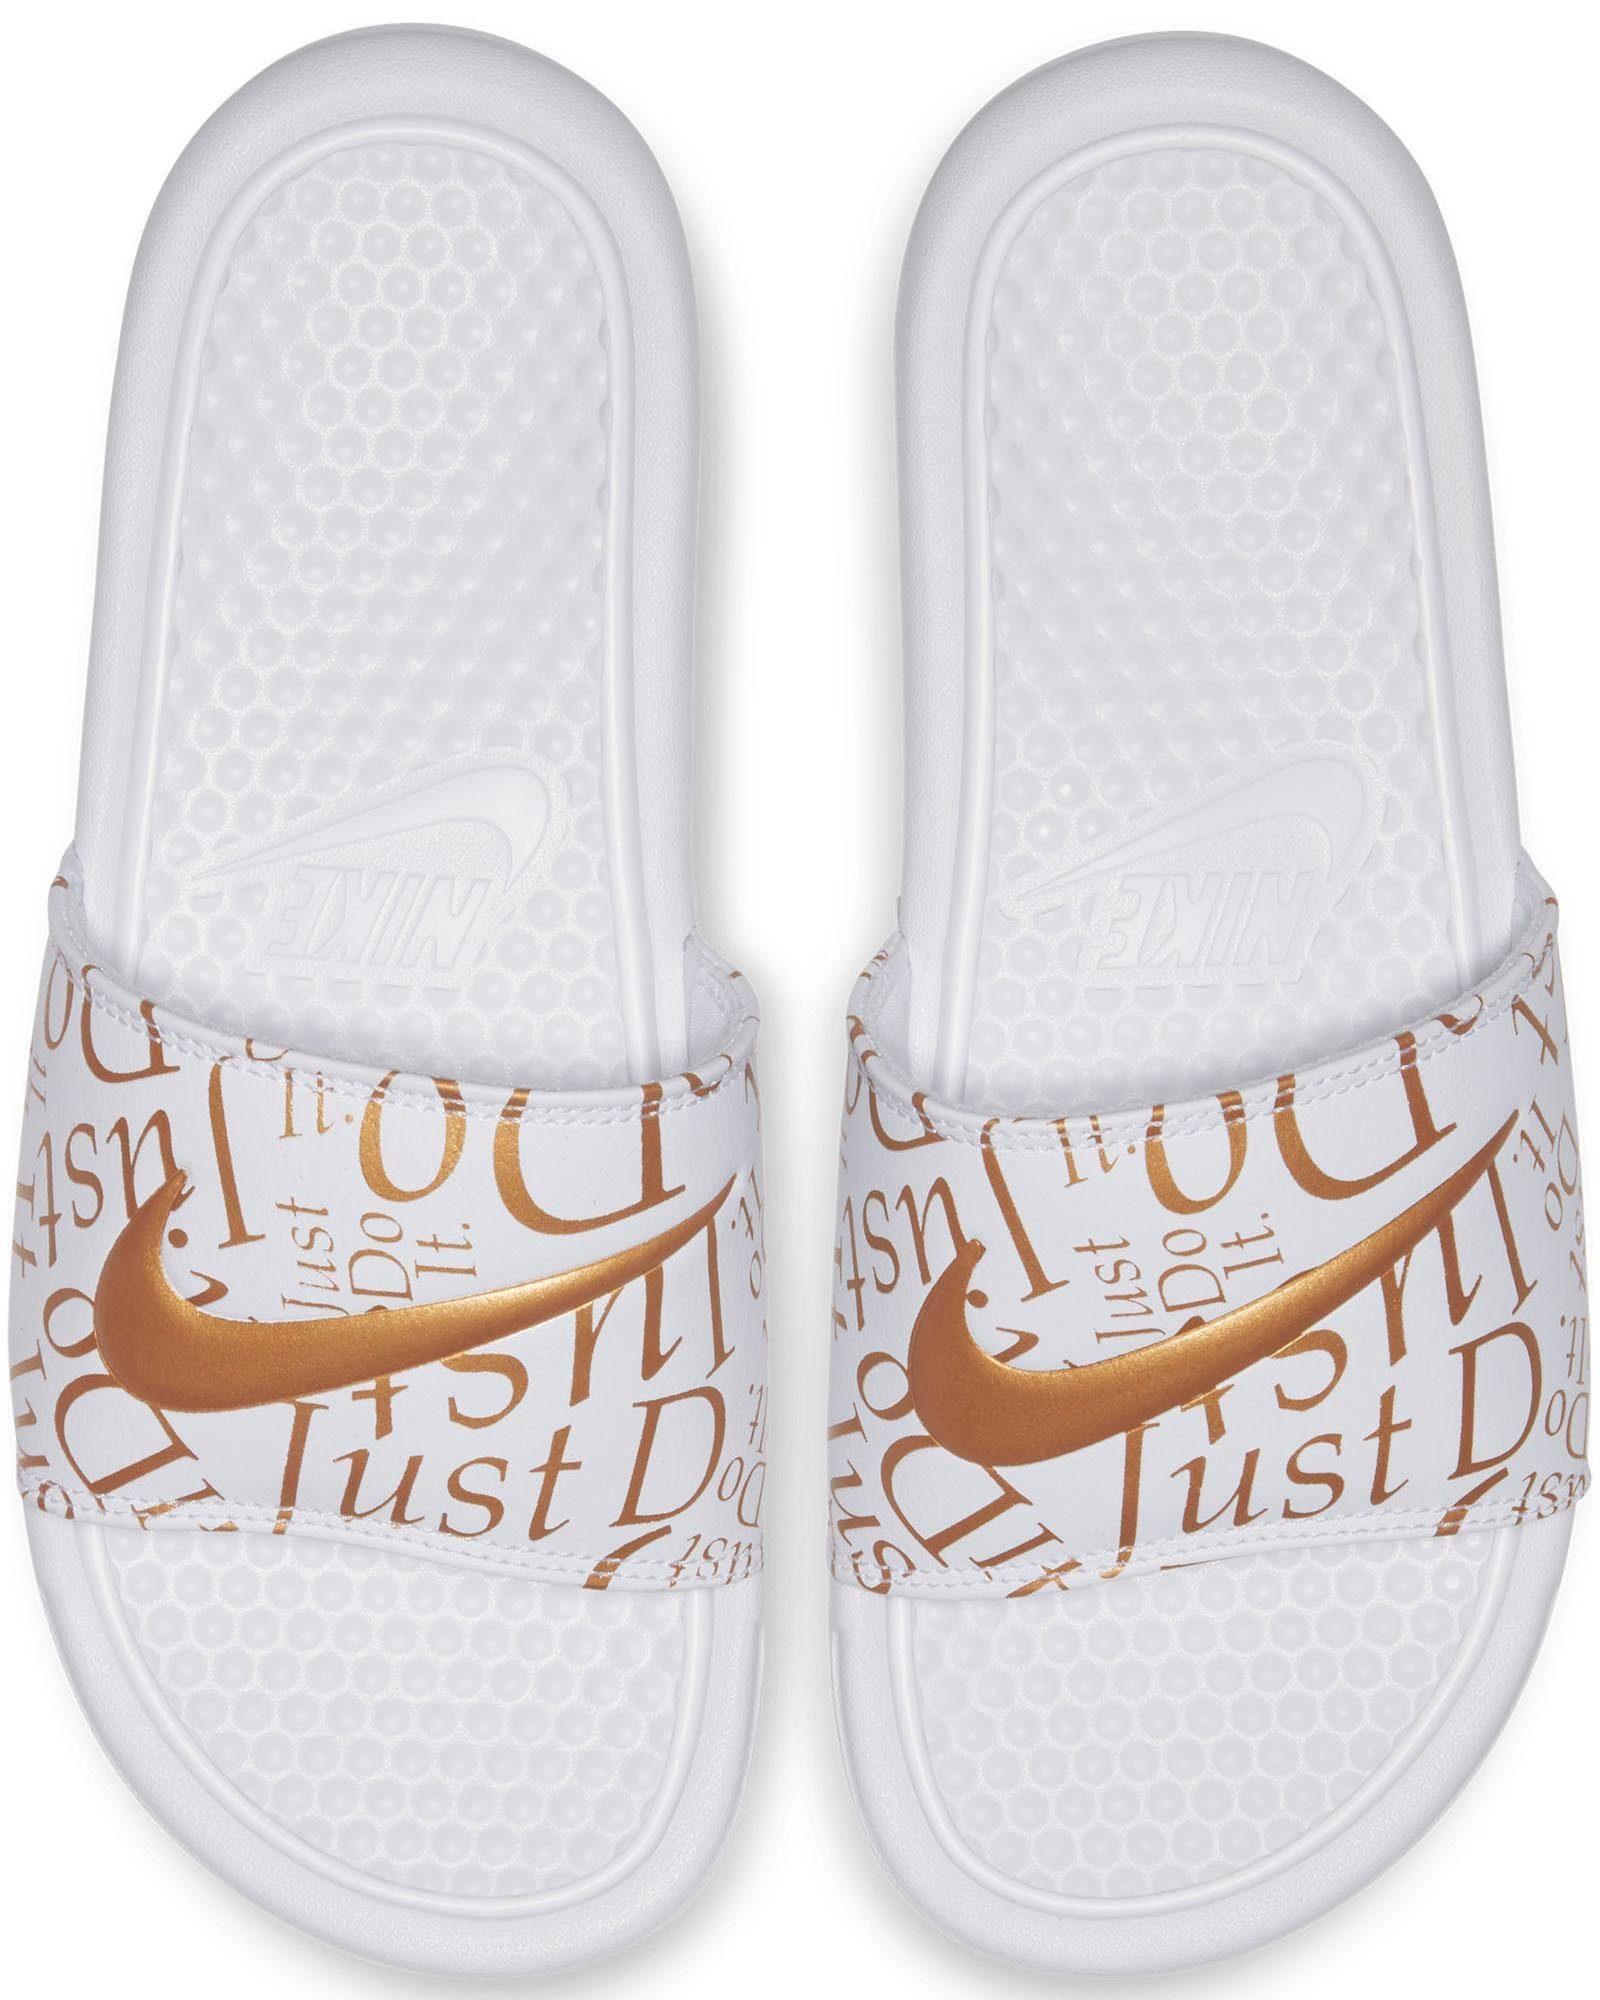 Nike Sportswear »Wmns Benassi Just do it« Badesandale online kaufen | OTTO